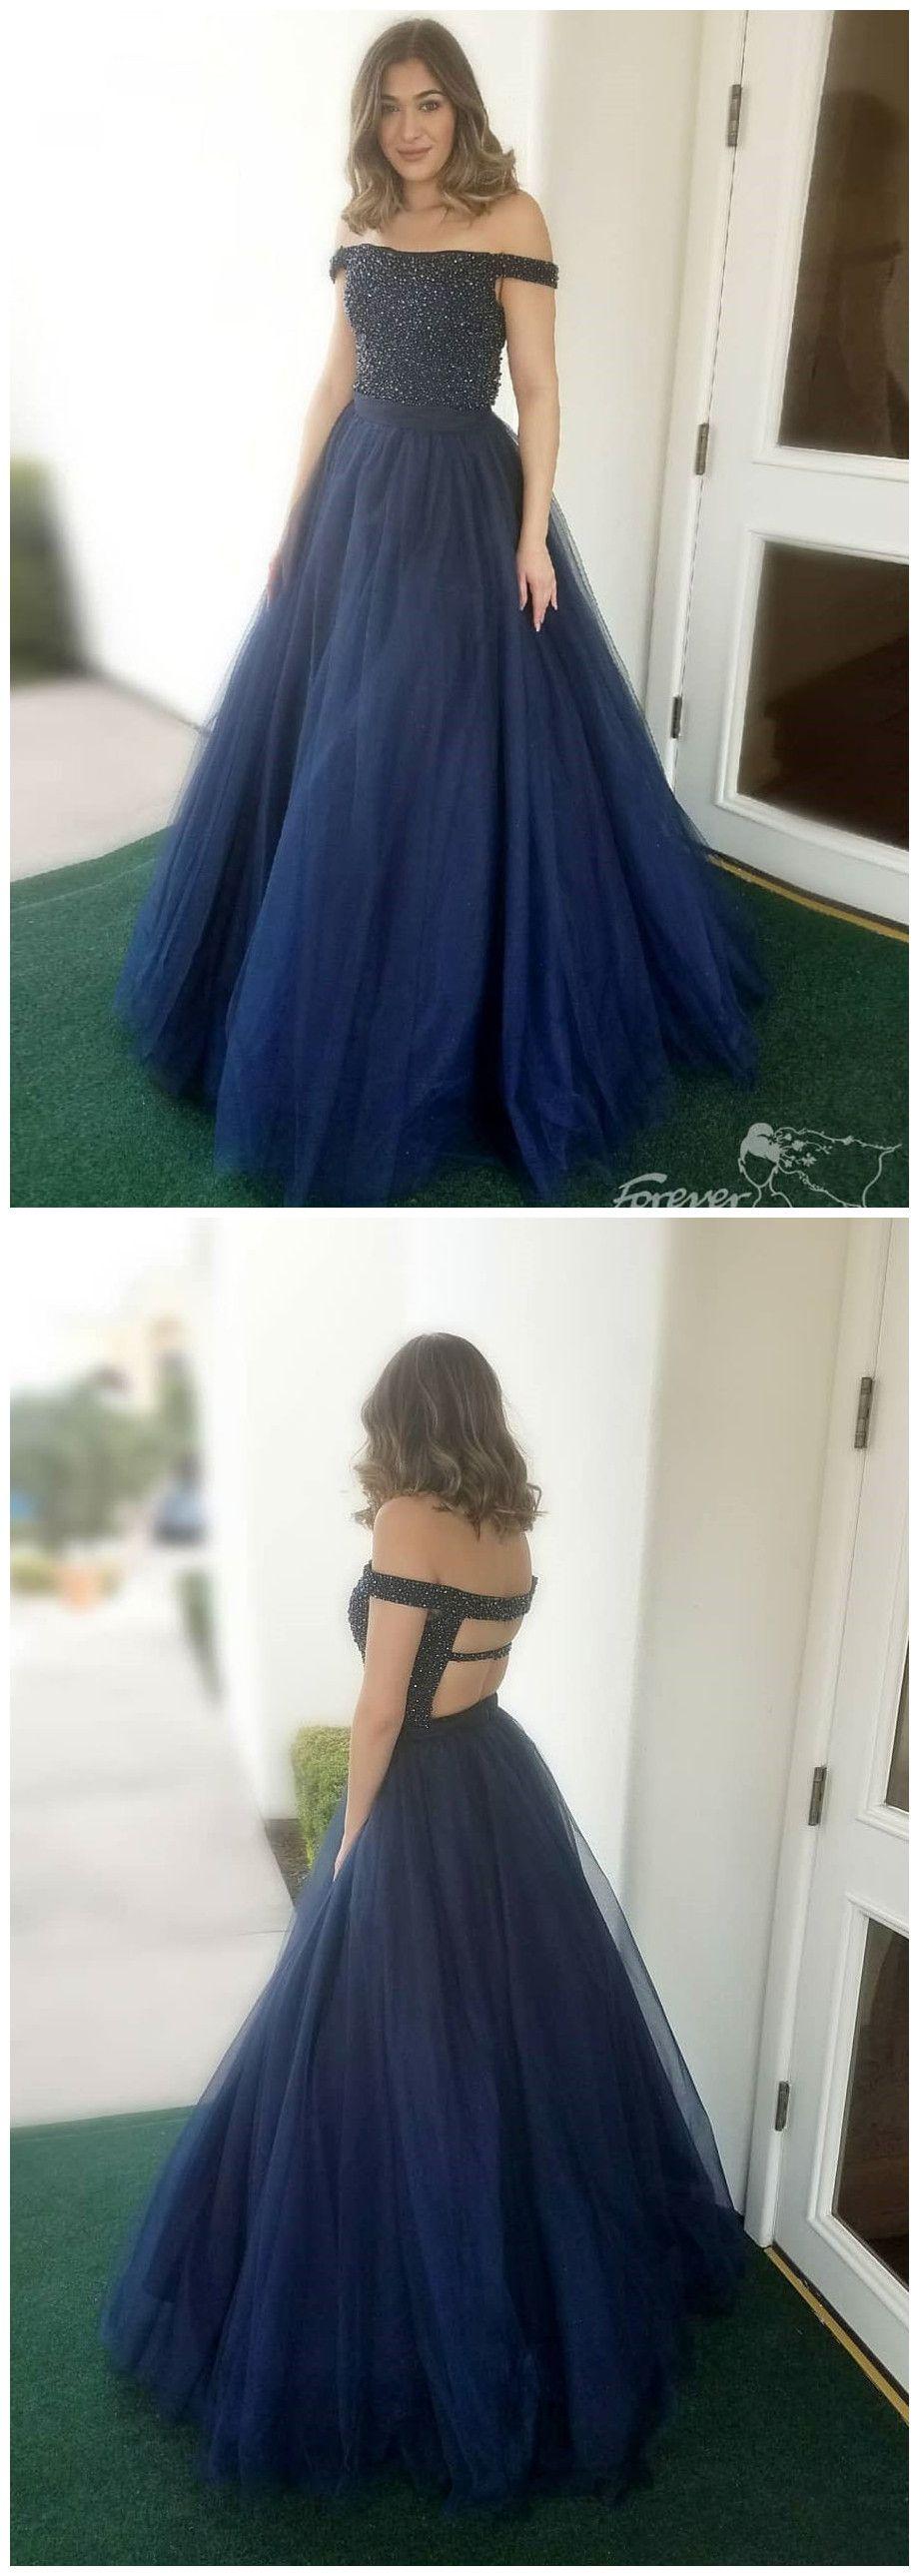 bdefde2829d9 prom dresses 2018,gorgeous prom dresses,prom dresses unique,prom dresses  elegant,prom dresses graduacion,prom dresses classy,prom dresses blue,prom  dresses ...